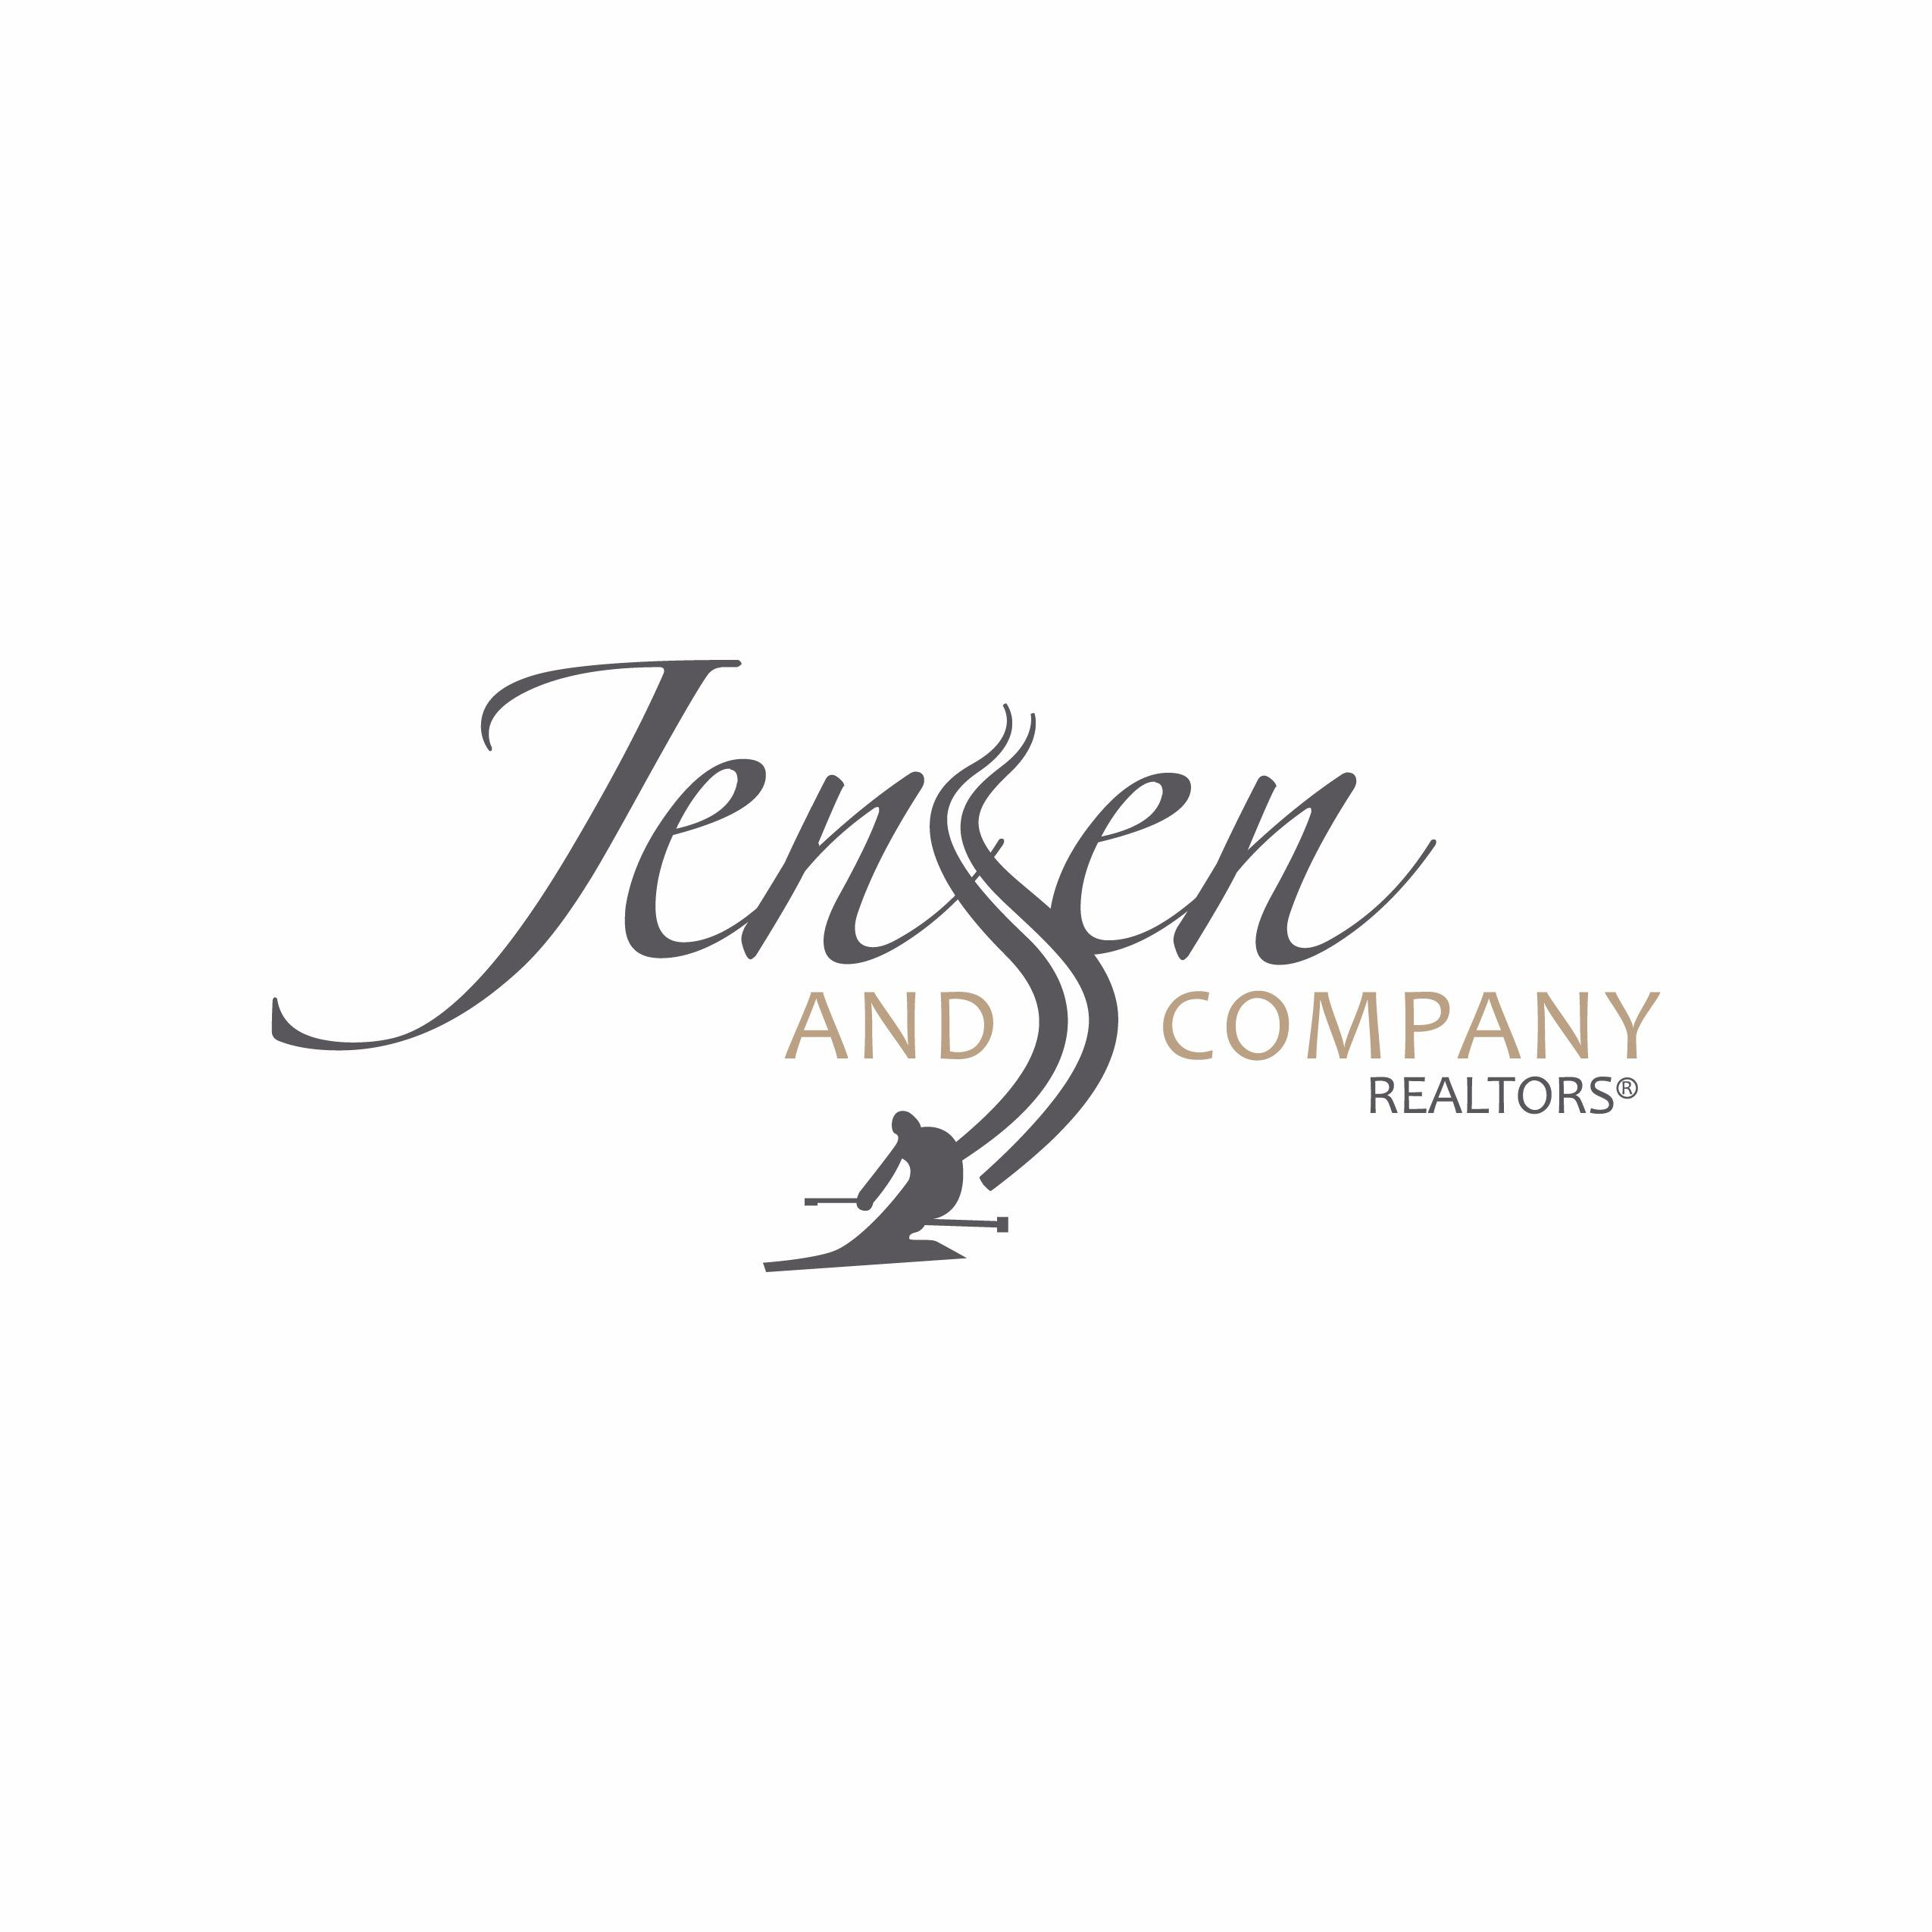 Jensen and Company